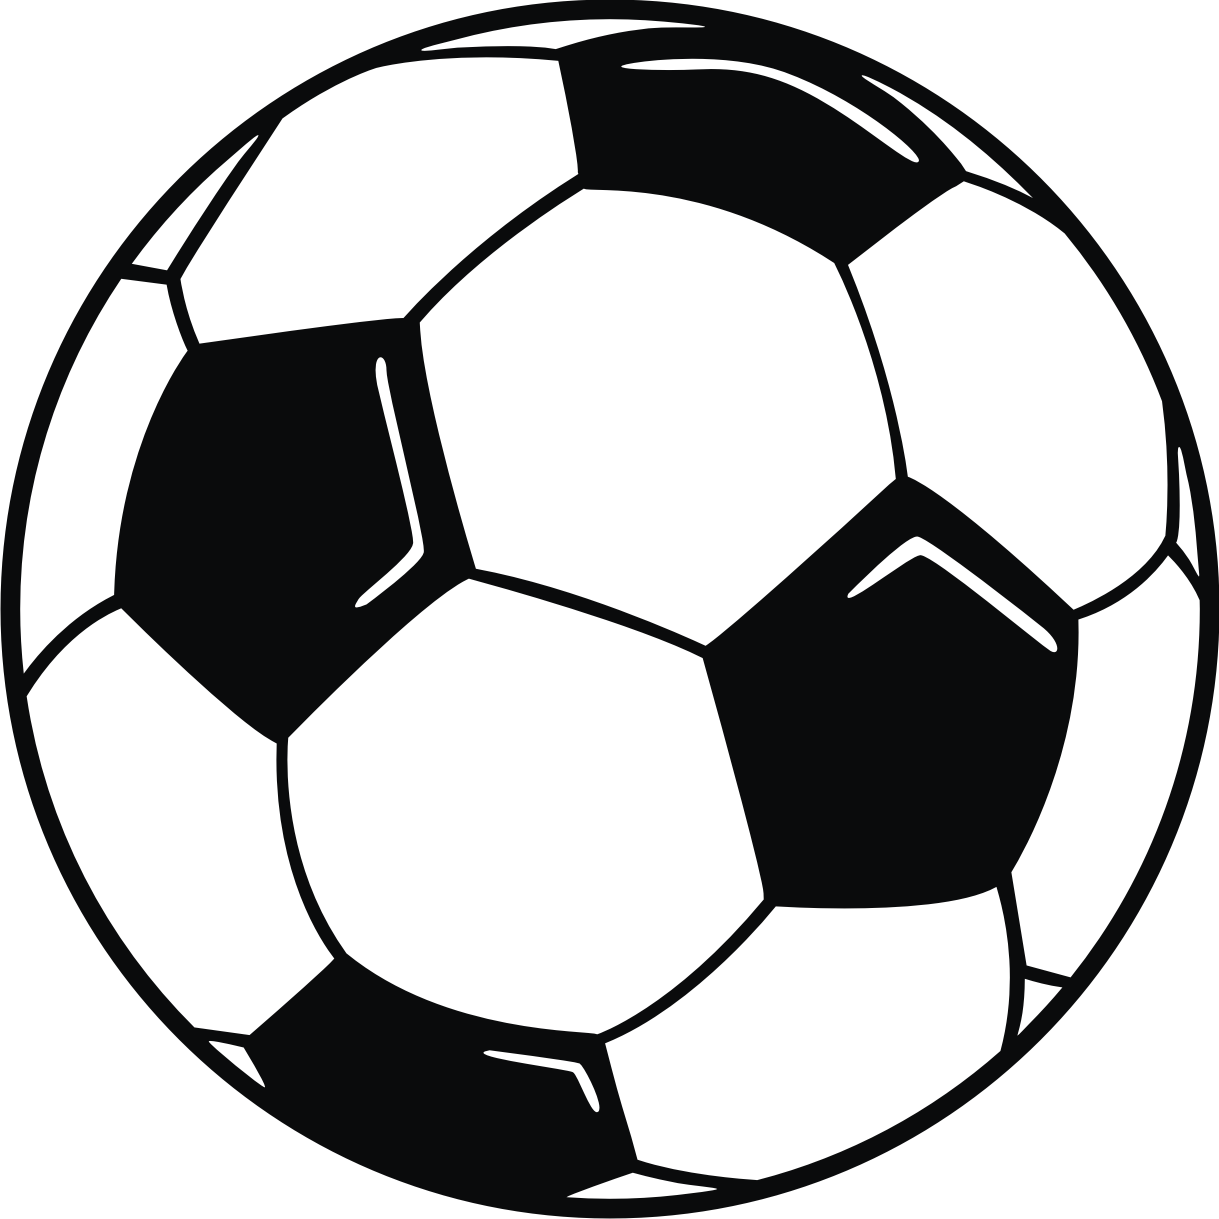 Soccer Border Clipart - Clipart Kid